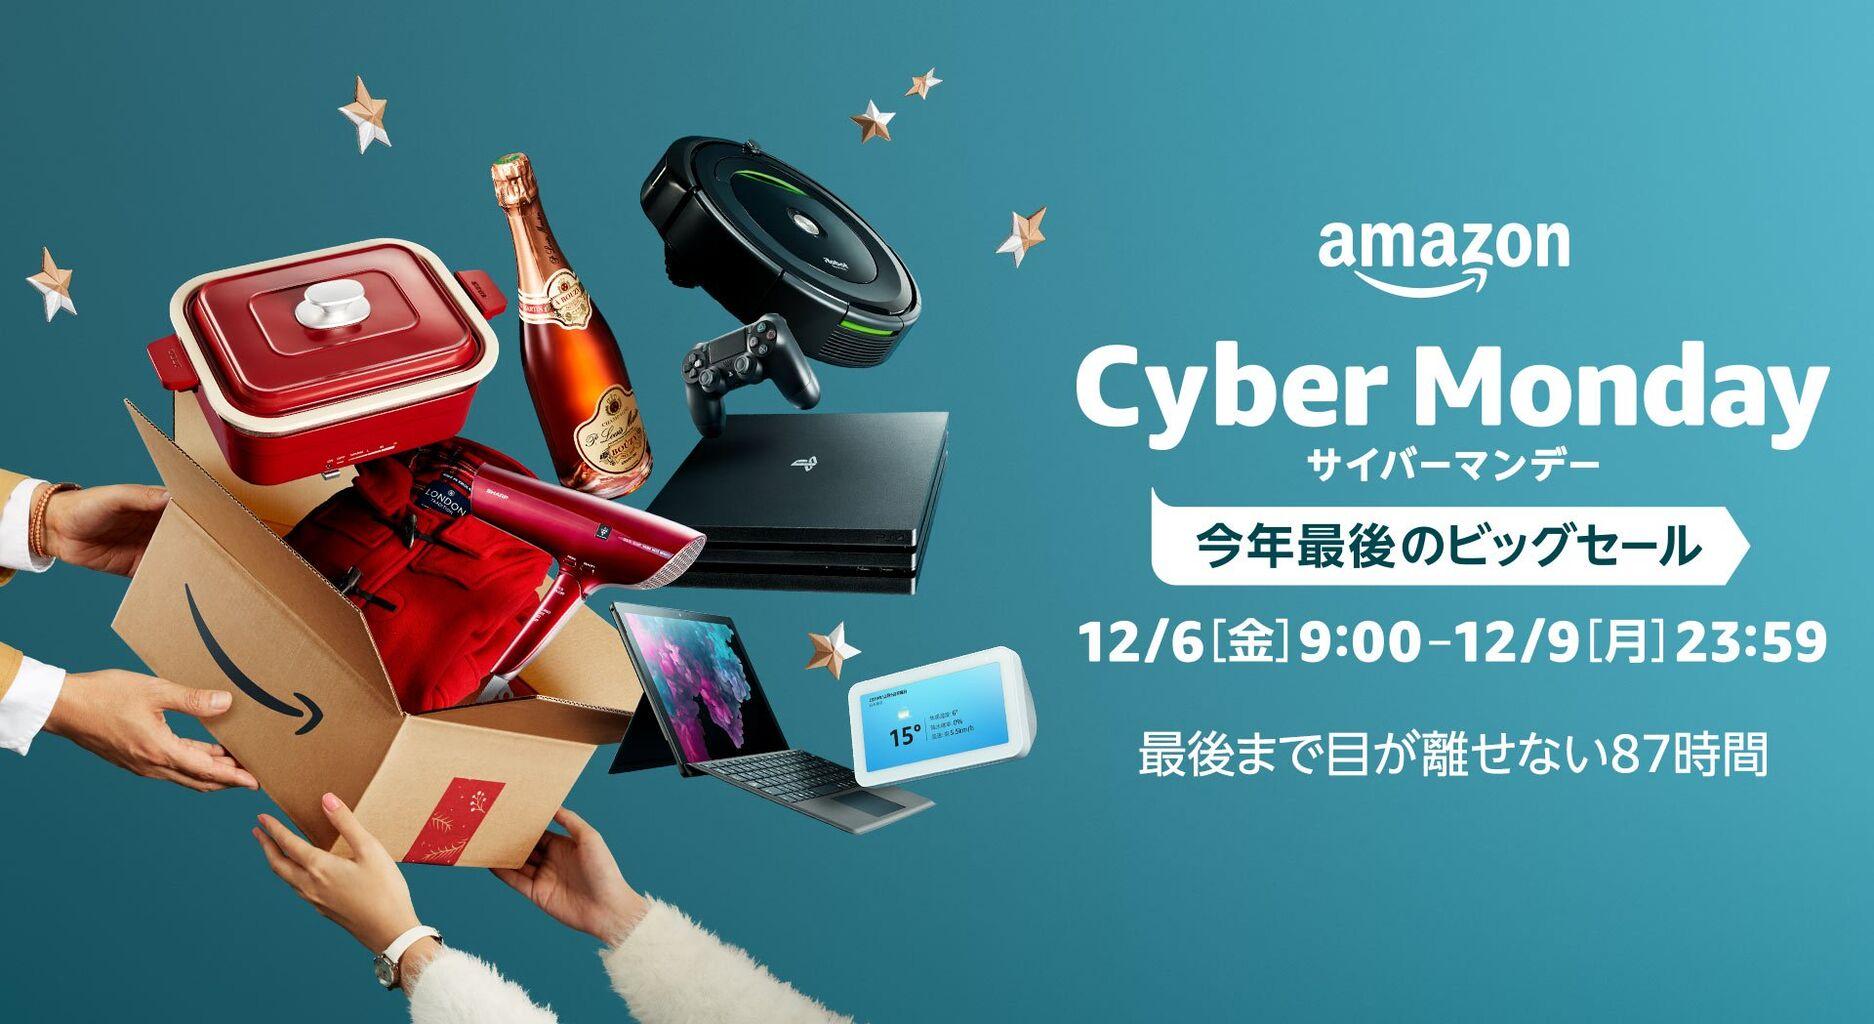 【Amazon CyberMonday】そろそろ開始!12/6(金)9時スタート!最大8.5%還元ポイントアップキャンペーンに参加しておこう!